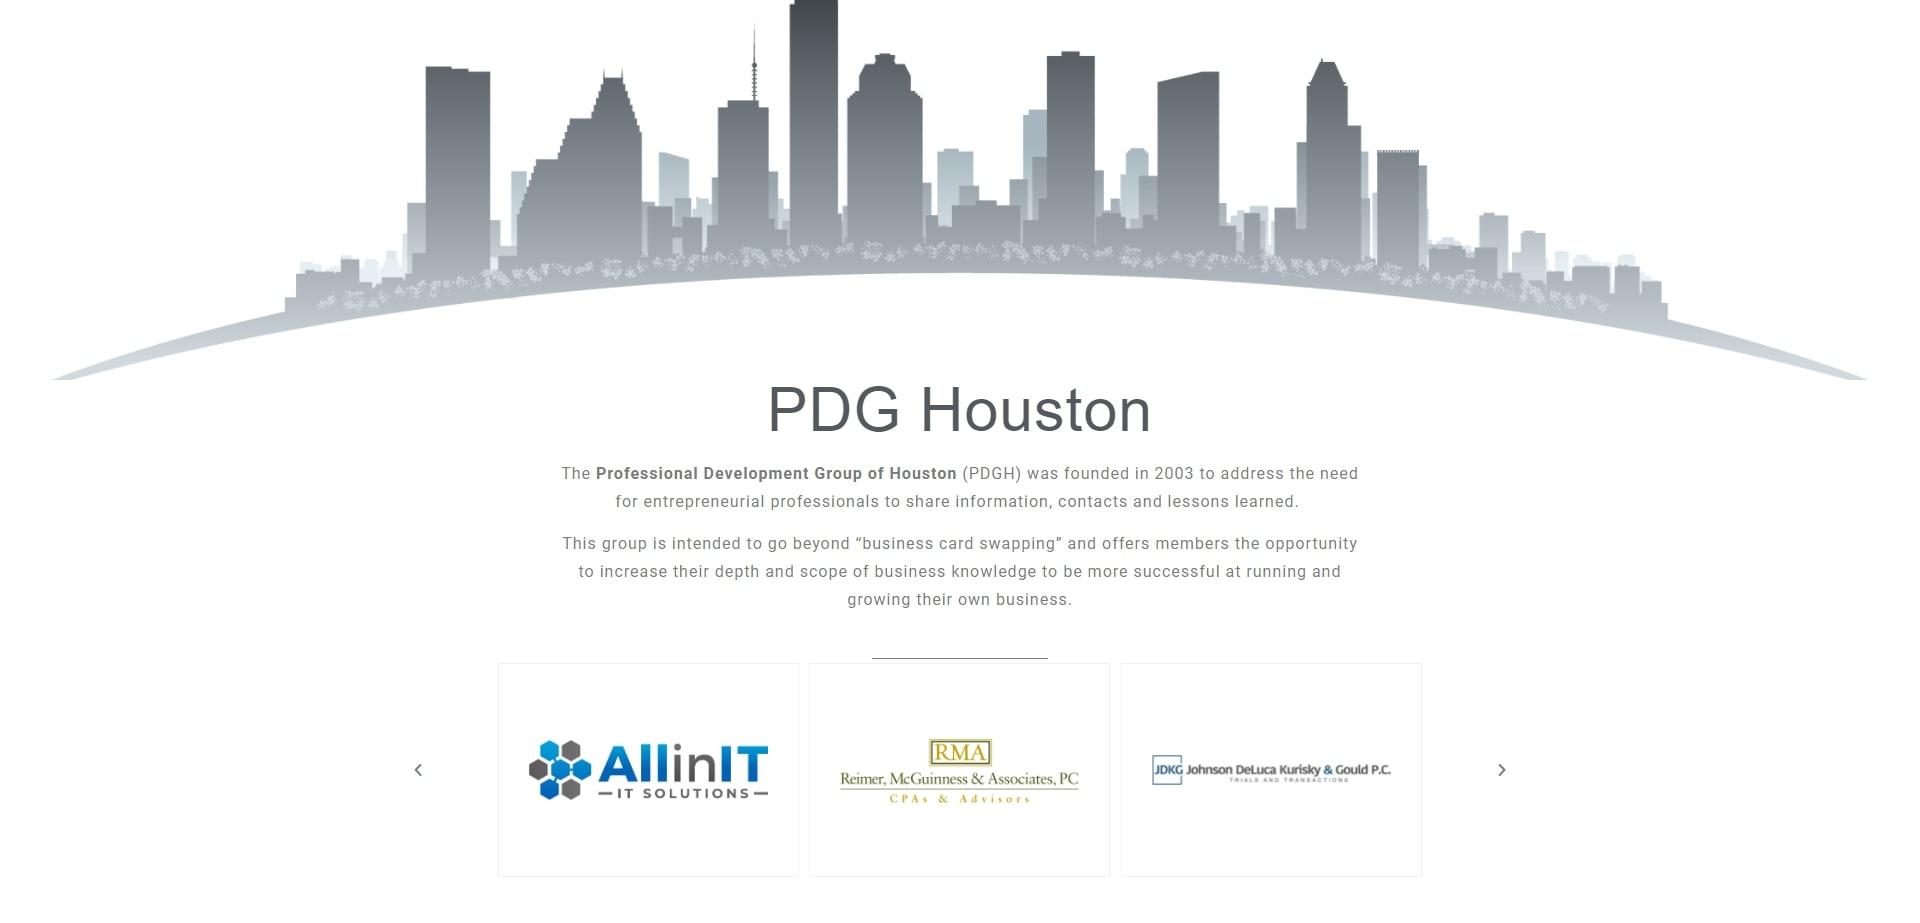 PDG Houston